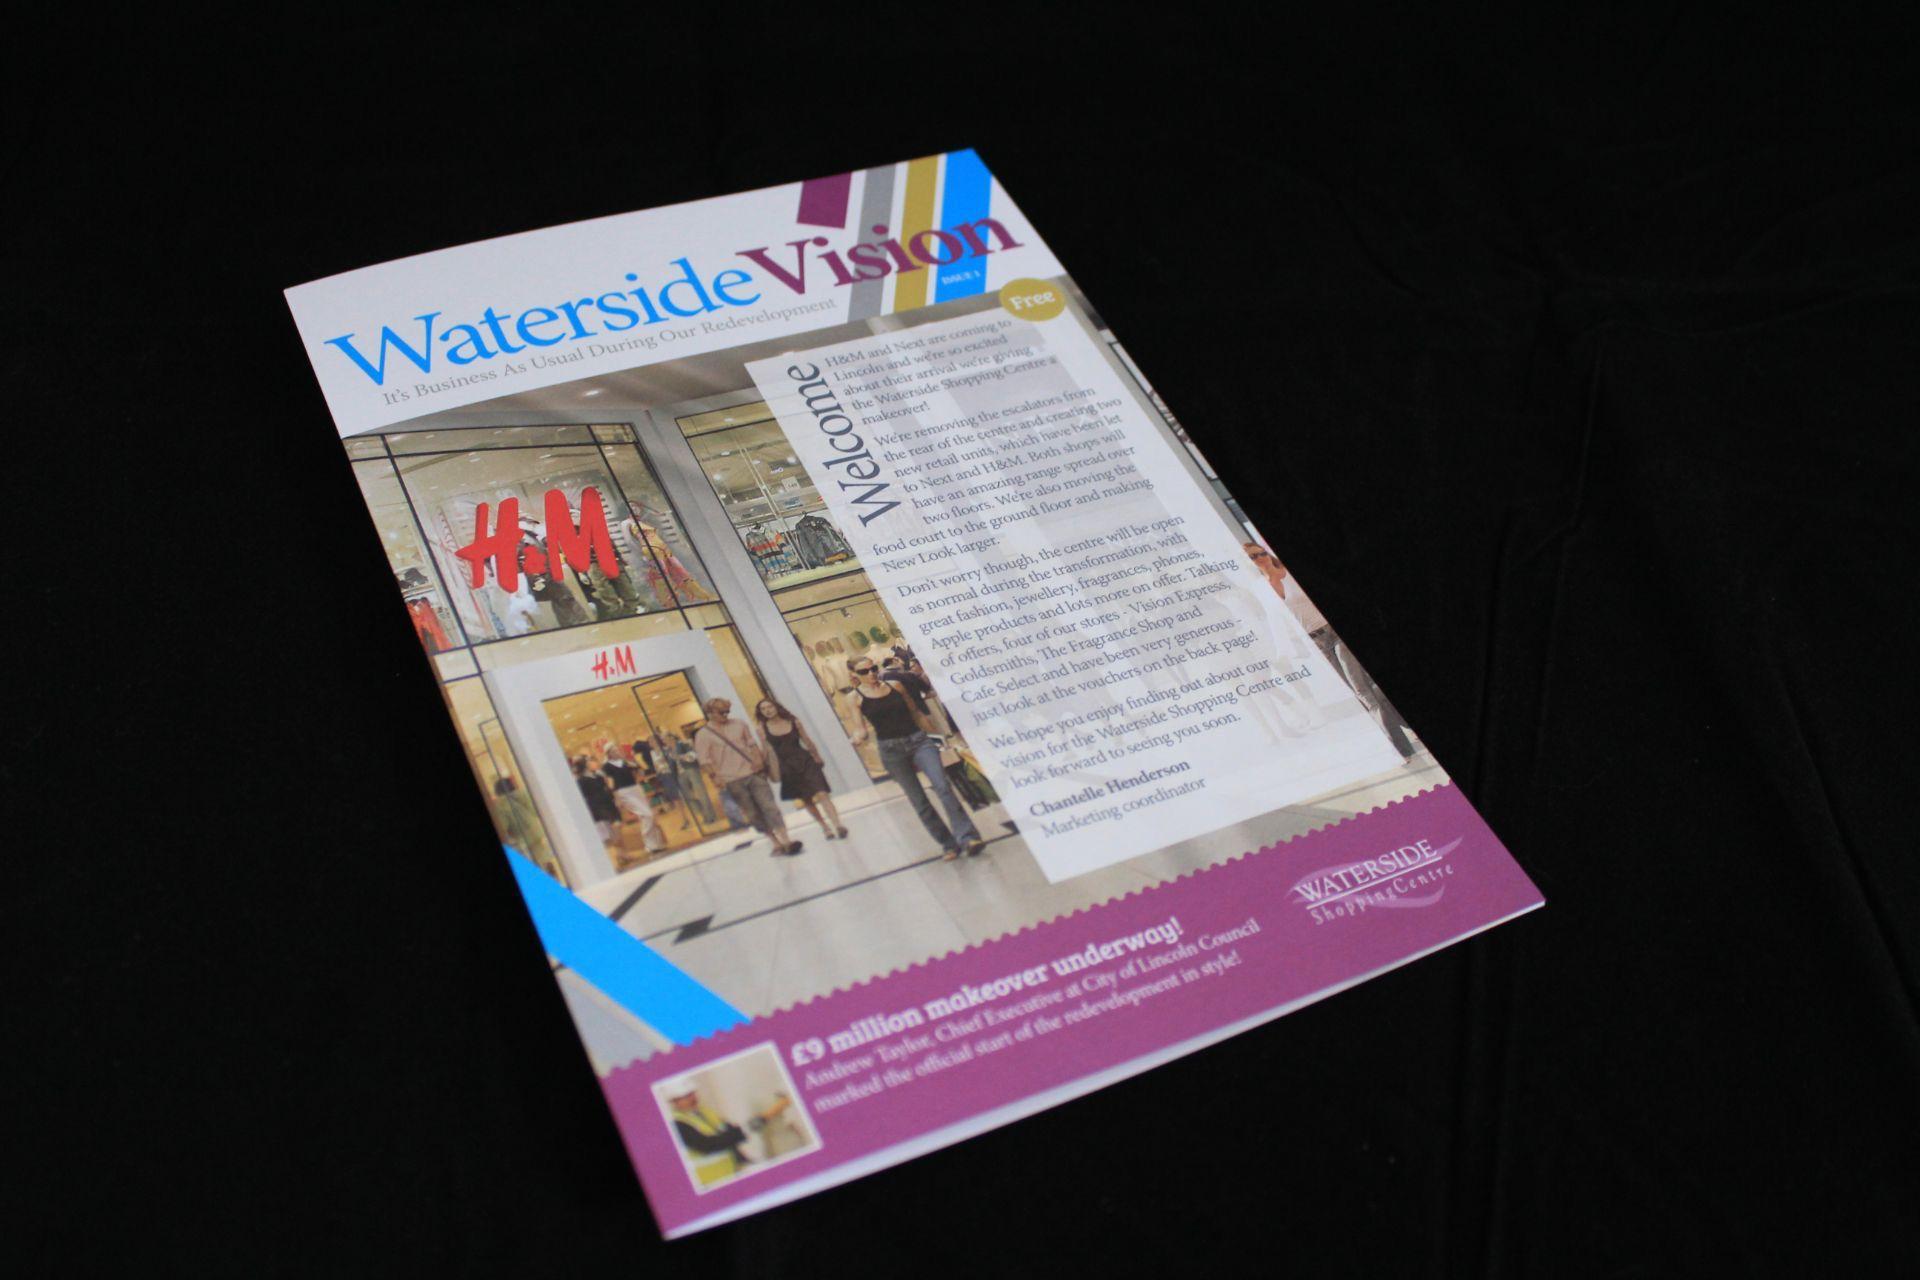 http://wearelava.co.uk/wp-content/uploads/2016/06/Waterside_Vision.jpg